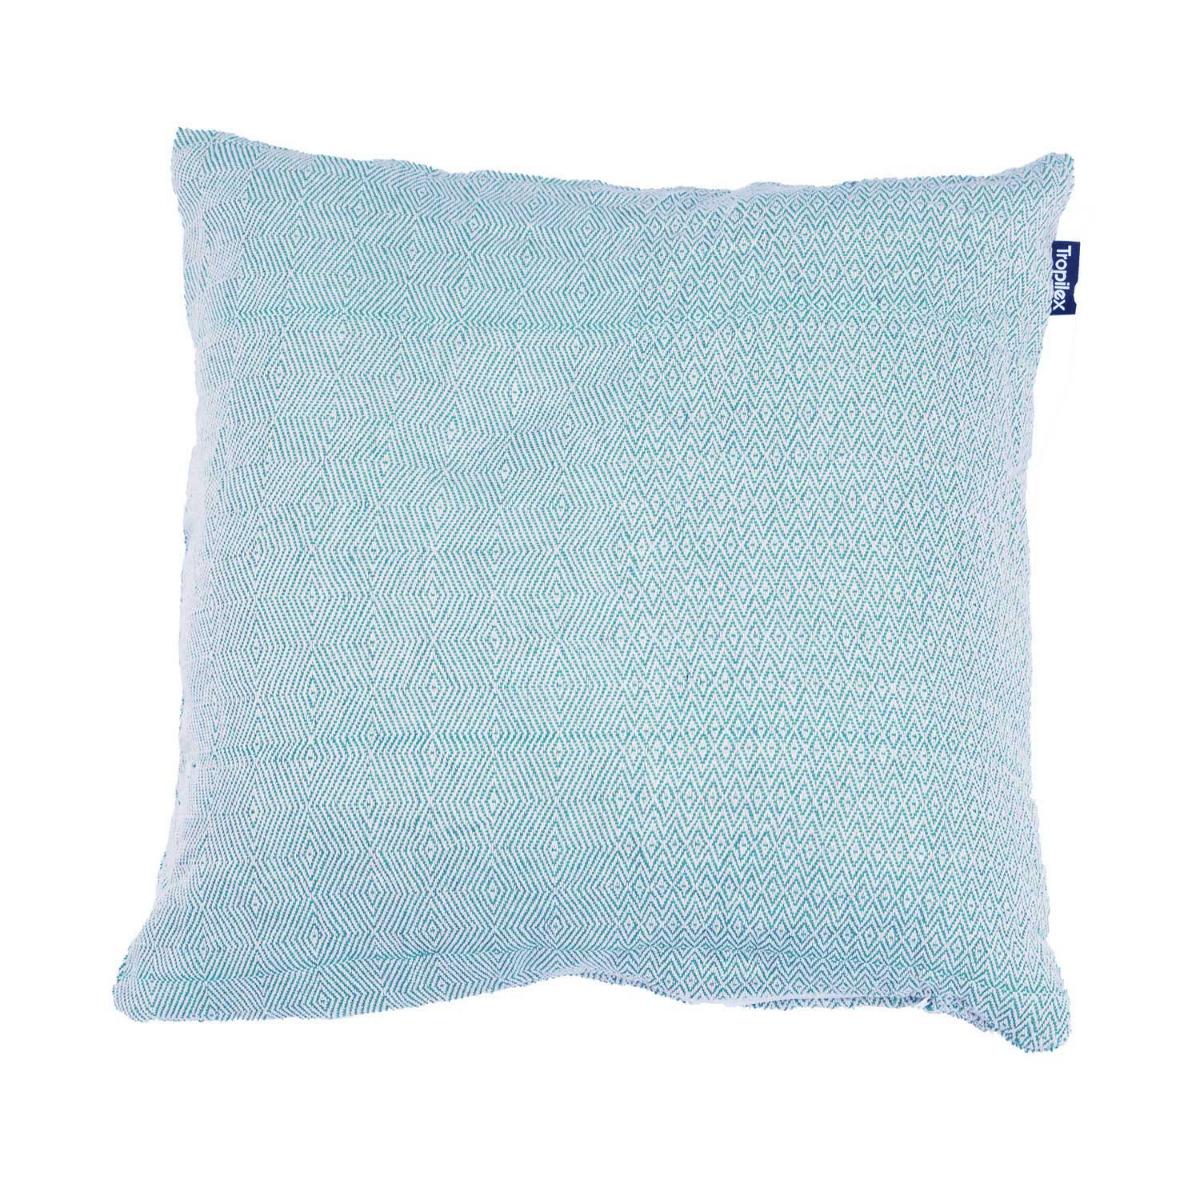 'Natural' Blue Kussentje - Blauw - Tropilex �